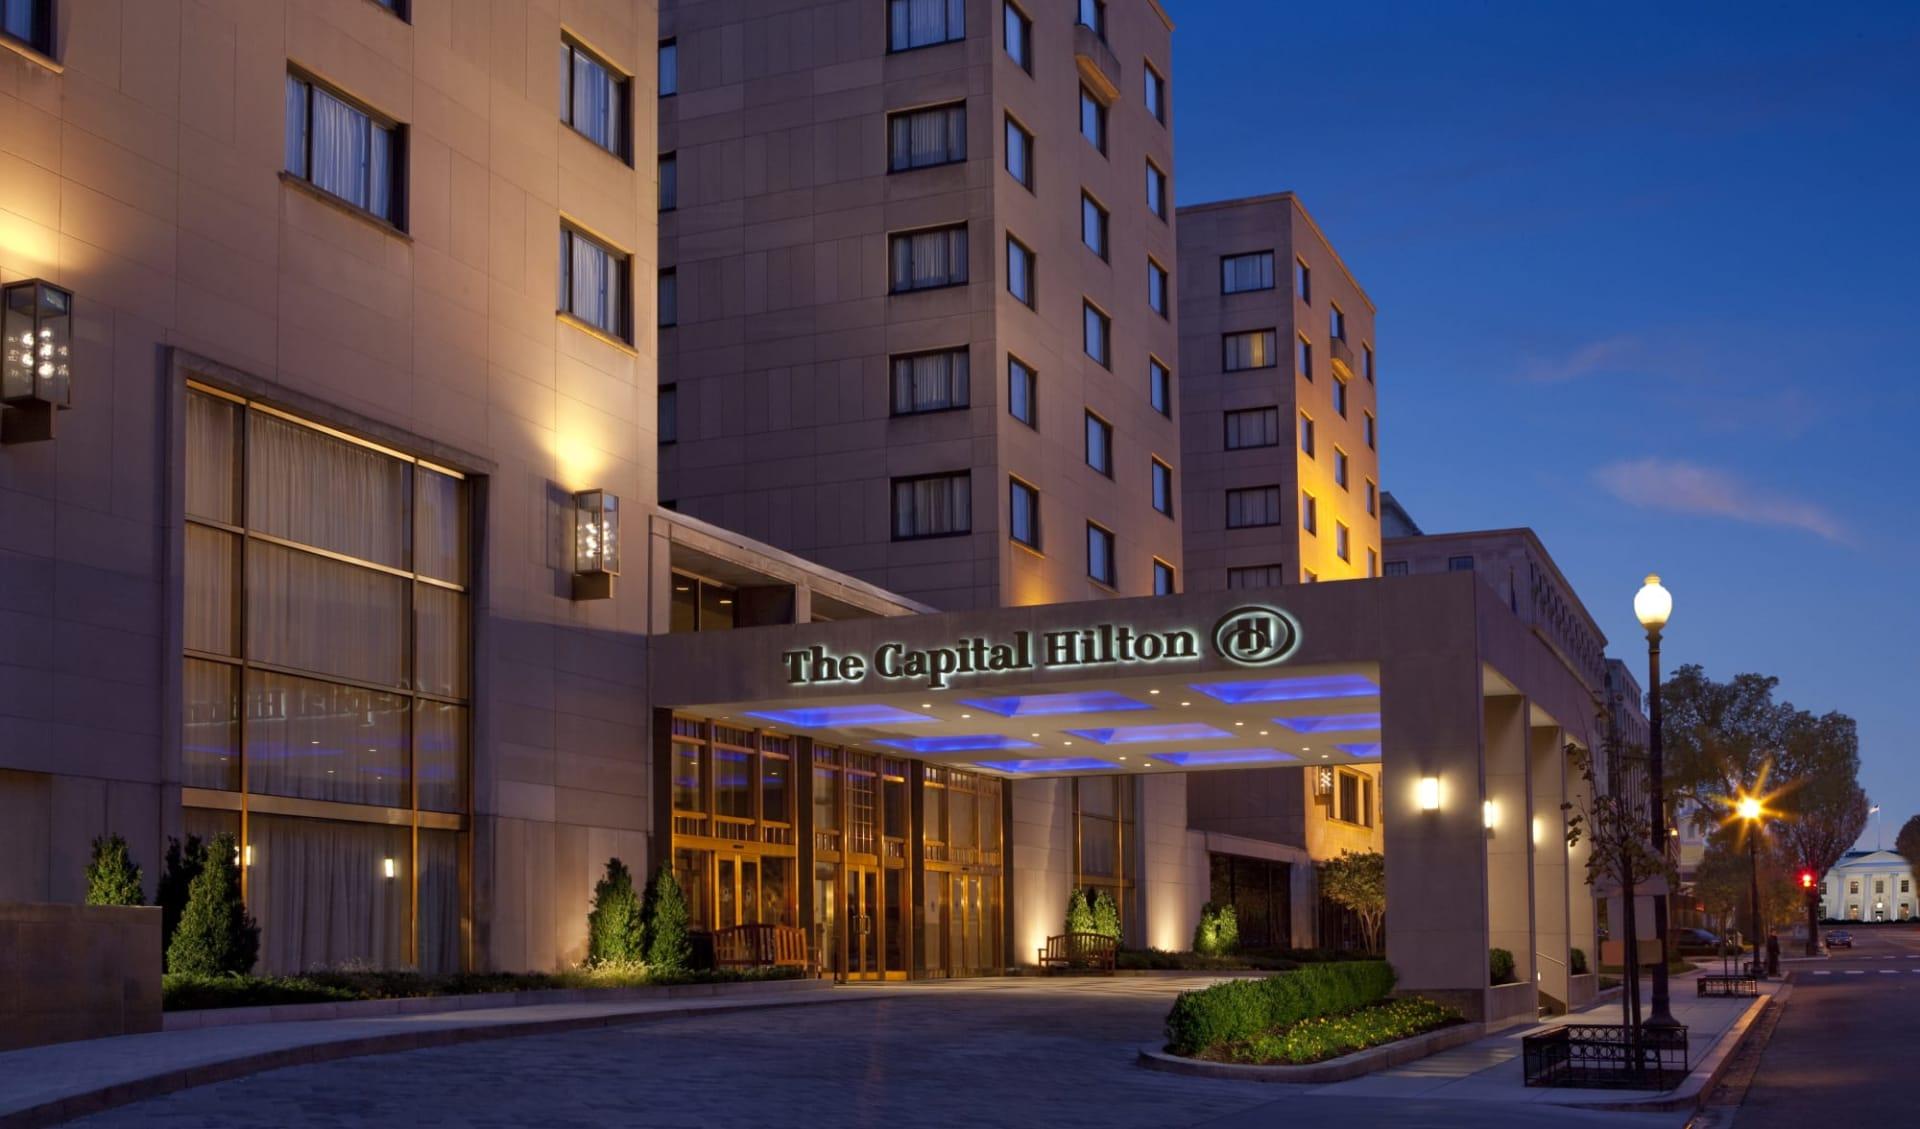 Capital Hilton in Washington D.C.: Exterior_Capital Hilton WAS_Aussenansicht_ATI